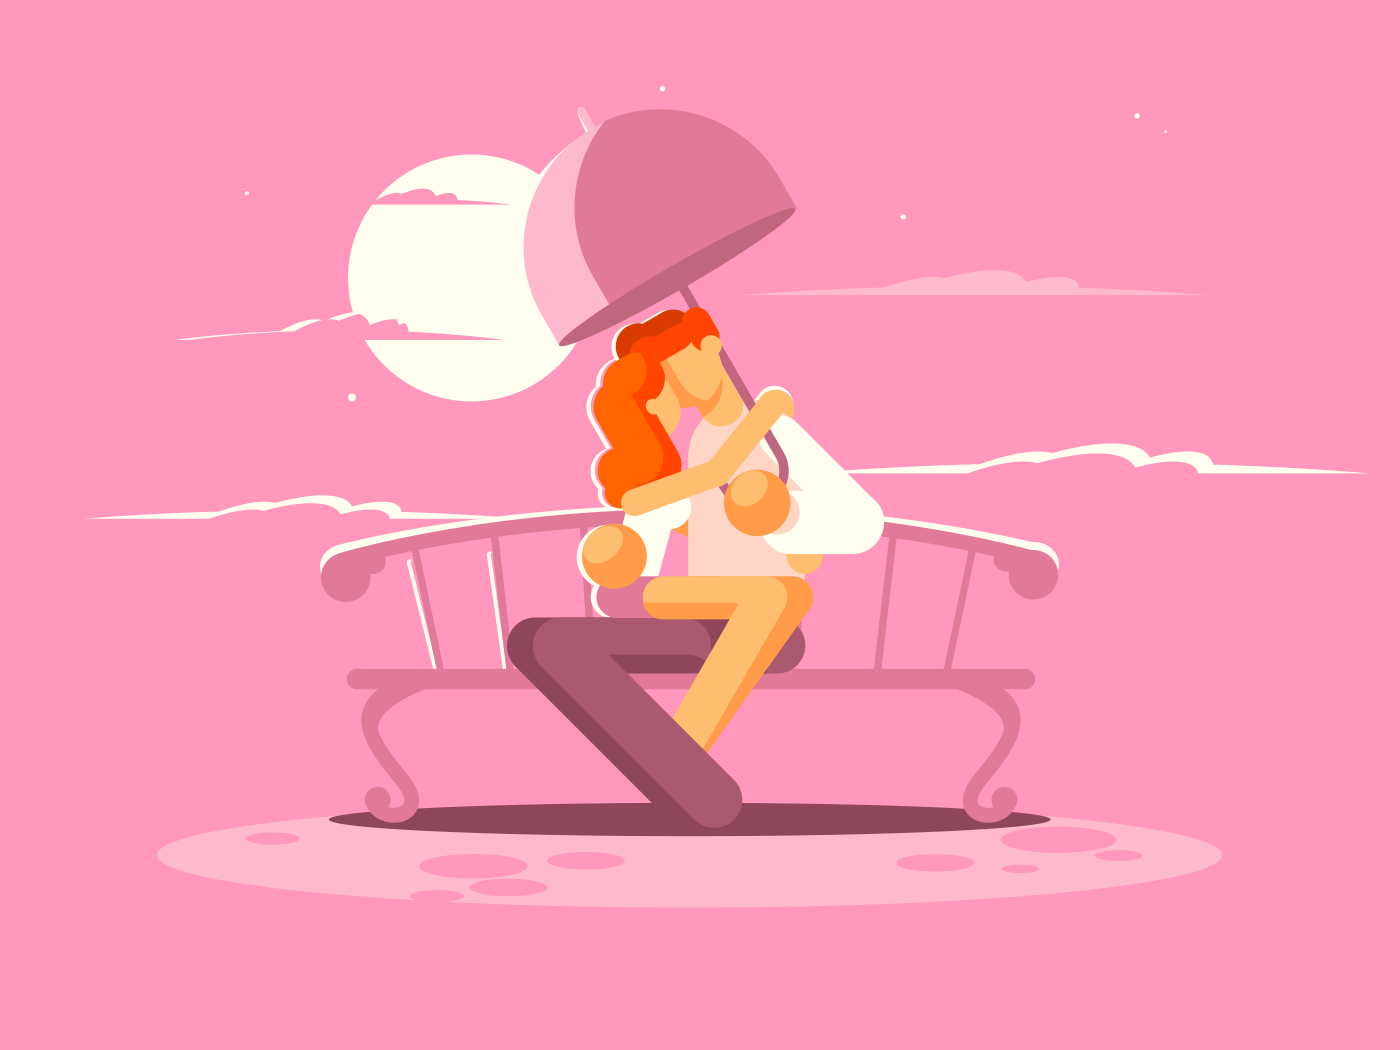 Loving couple under umbrella on bench illustration